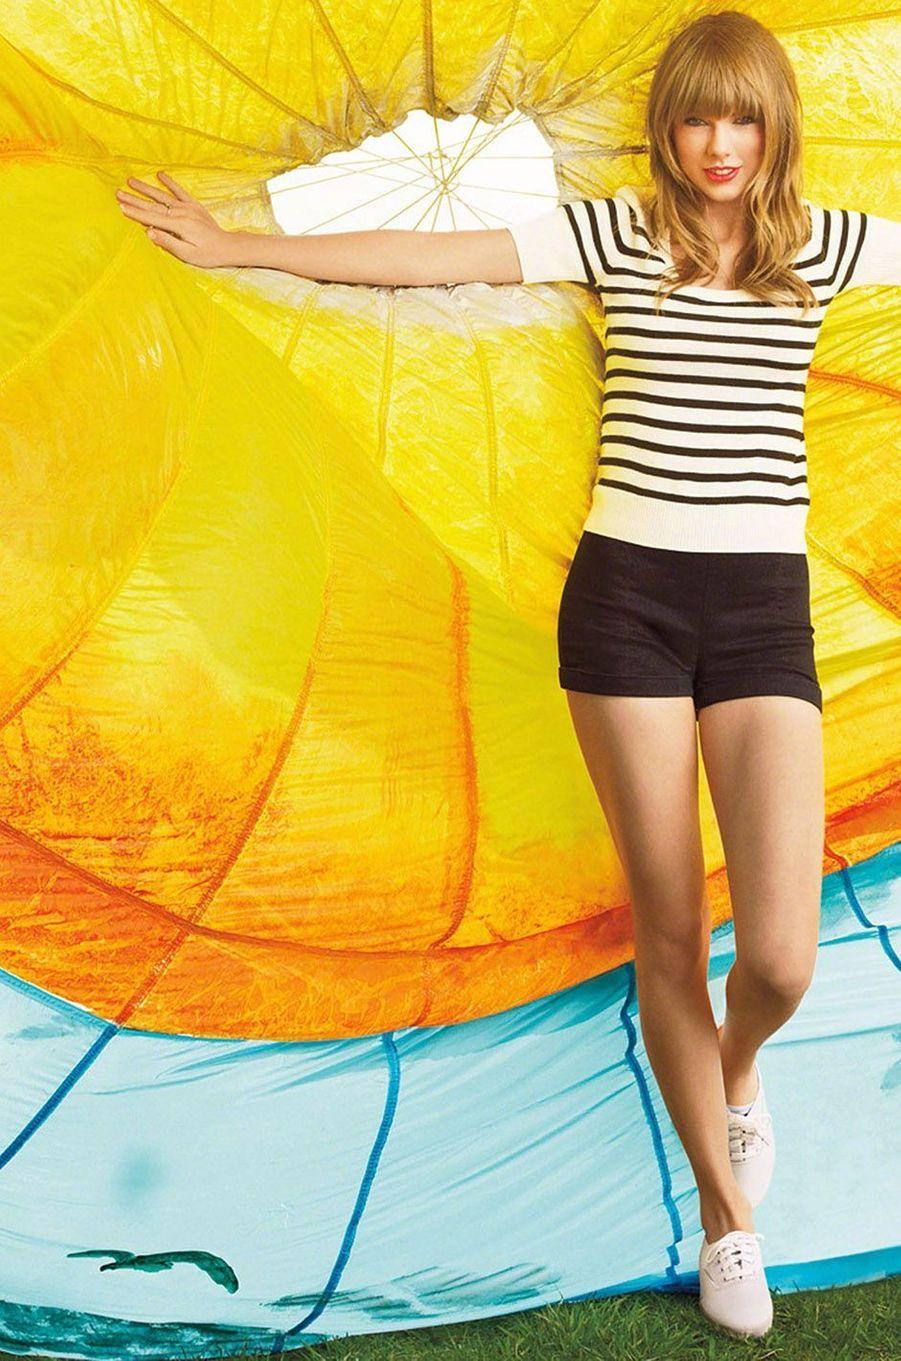 Taylor Swift une country girl devenue pop star.